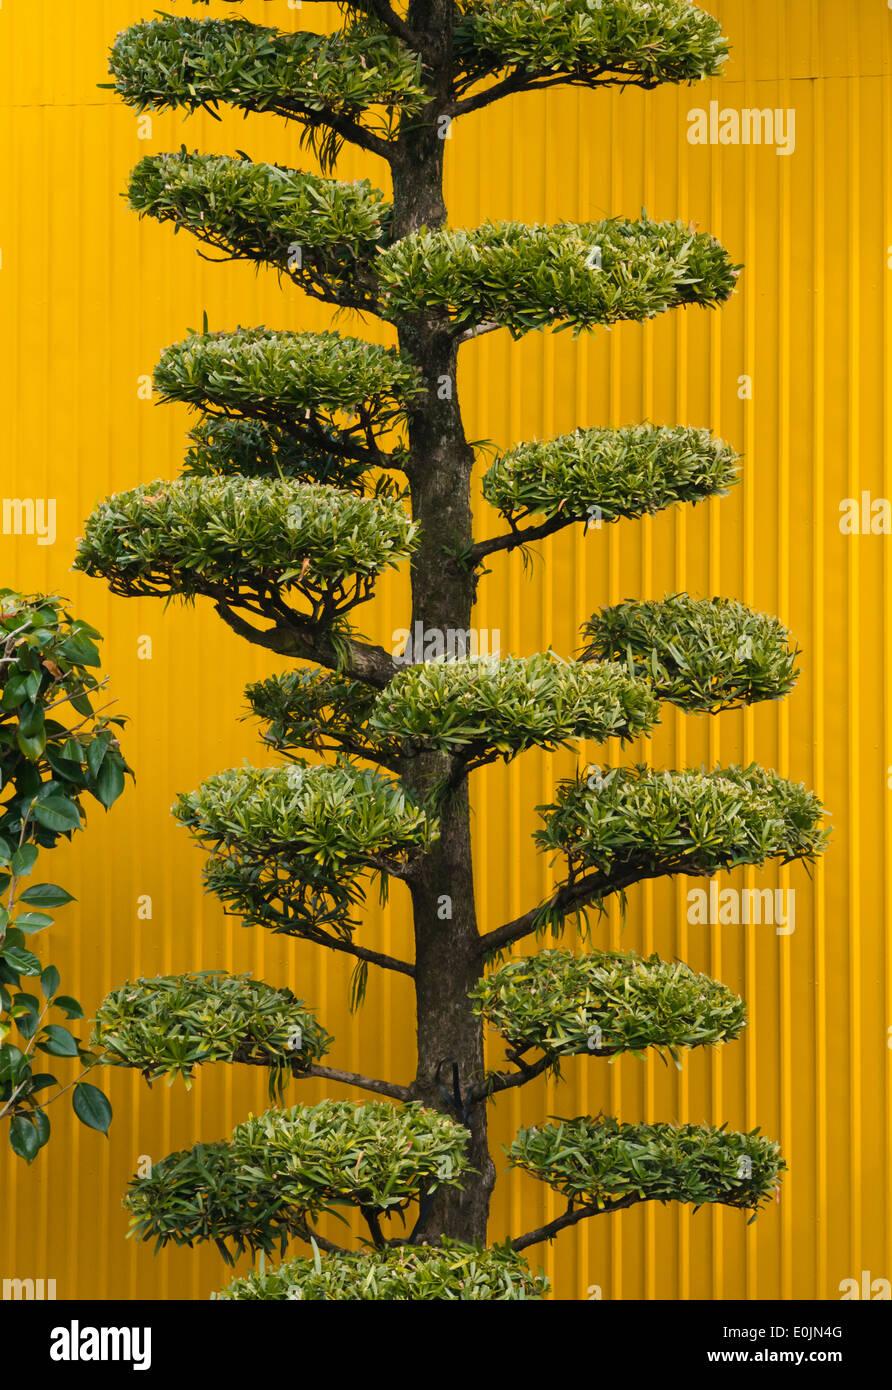 House with well trimmed tree, Aso, Kumamoto, Kyushu, Japan - Stock Image